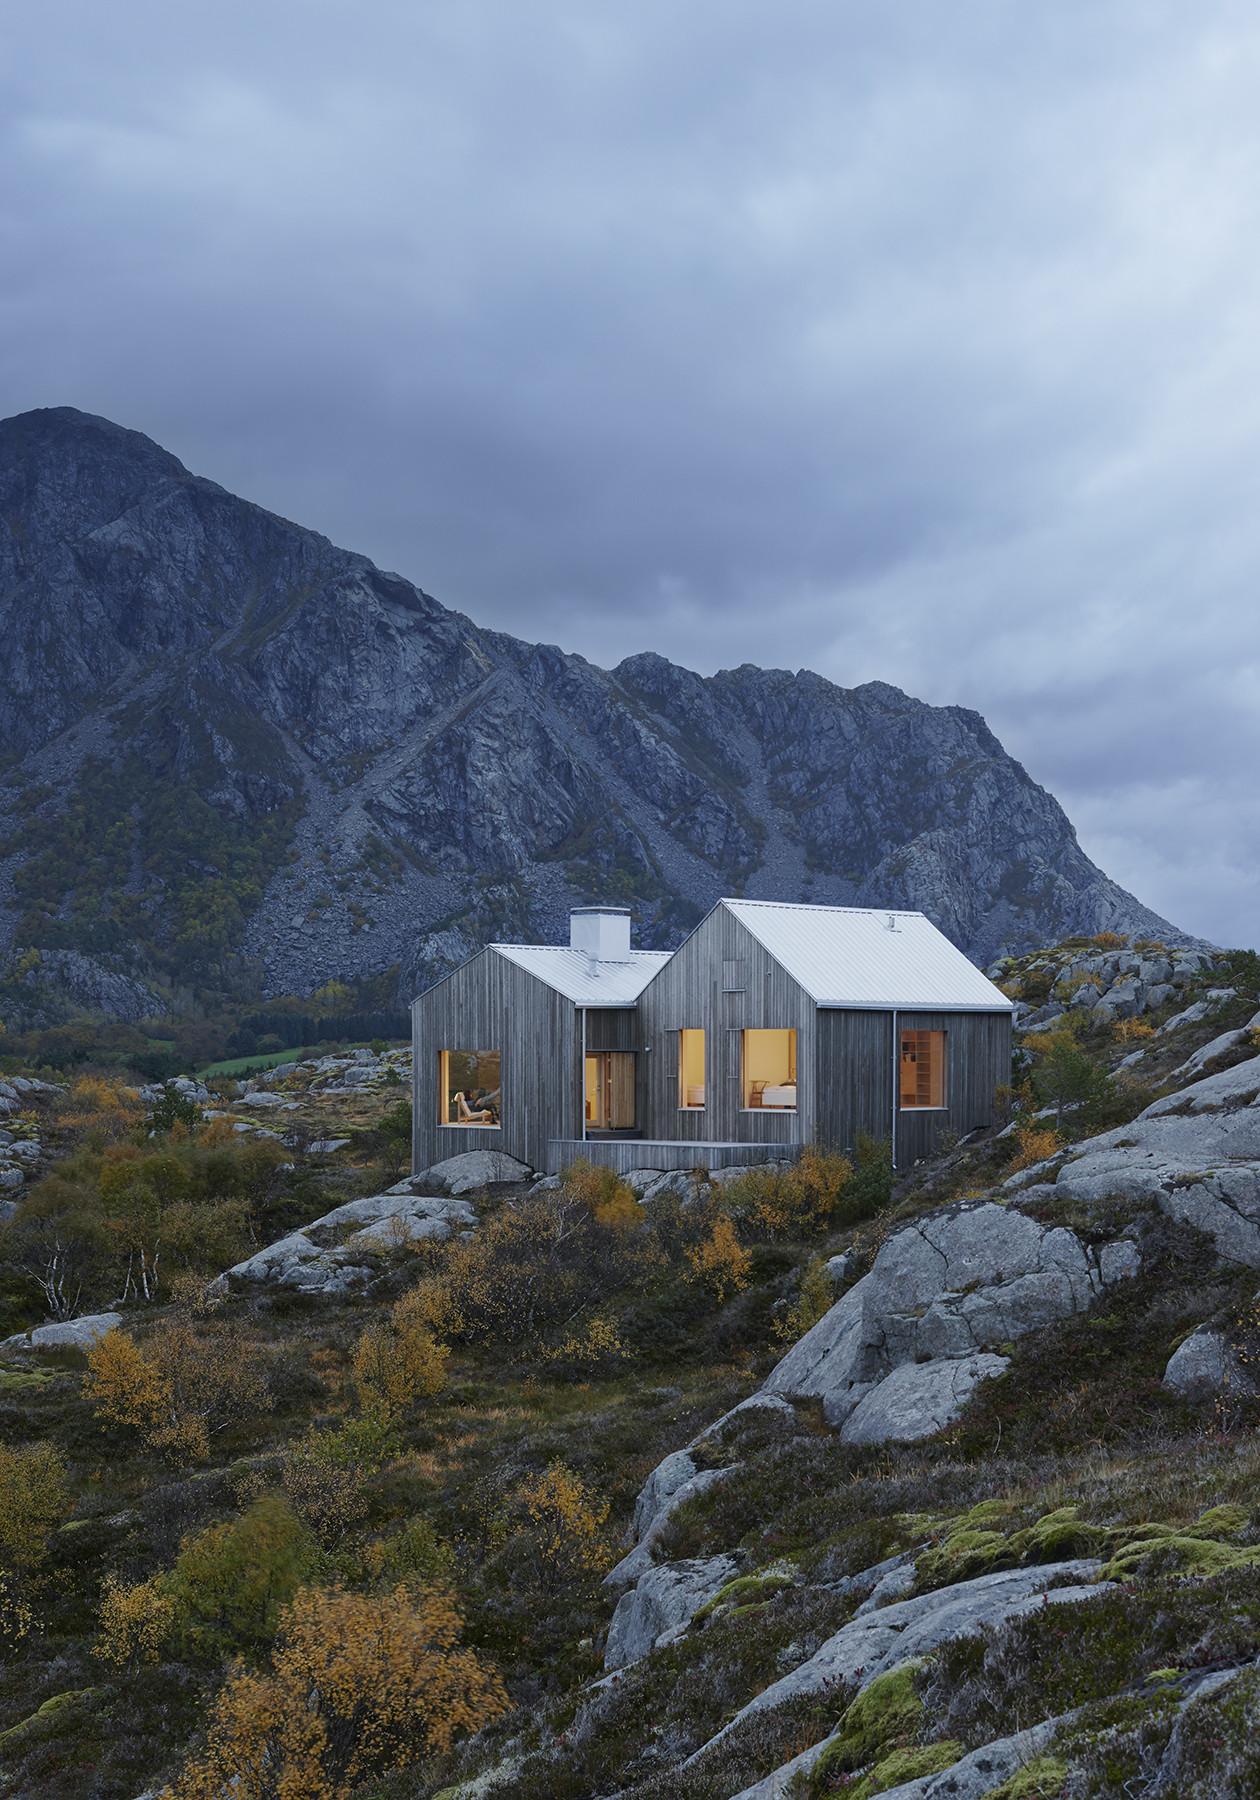 Cabaña en Vega / Kolman Boye Architects